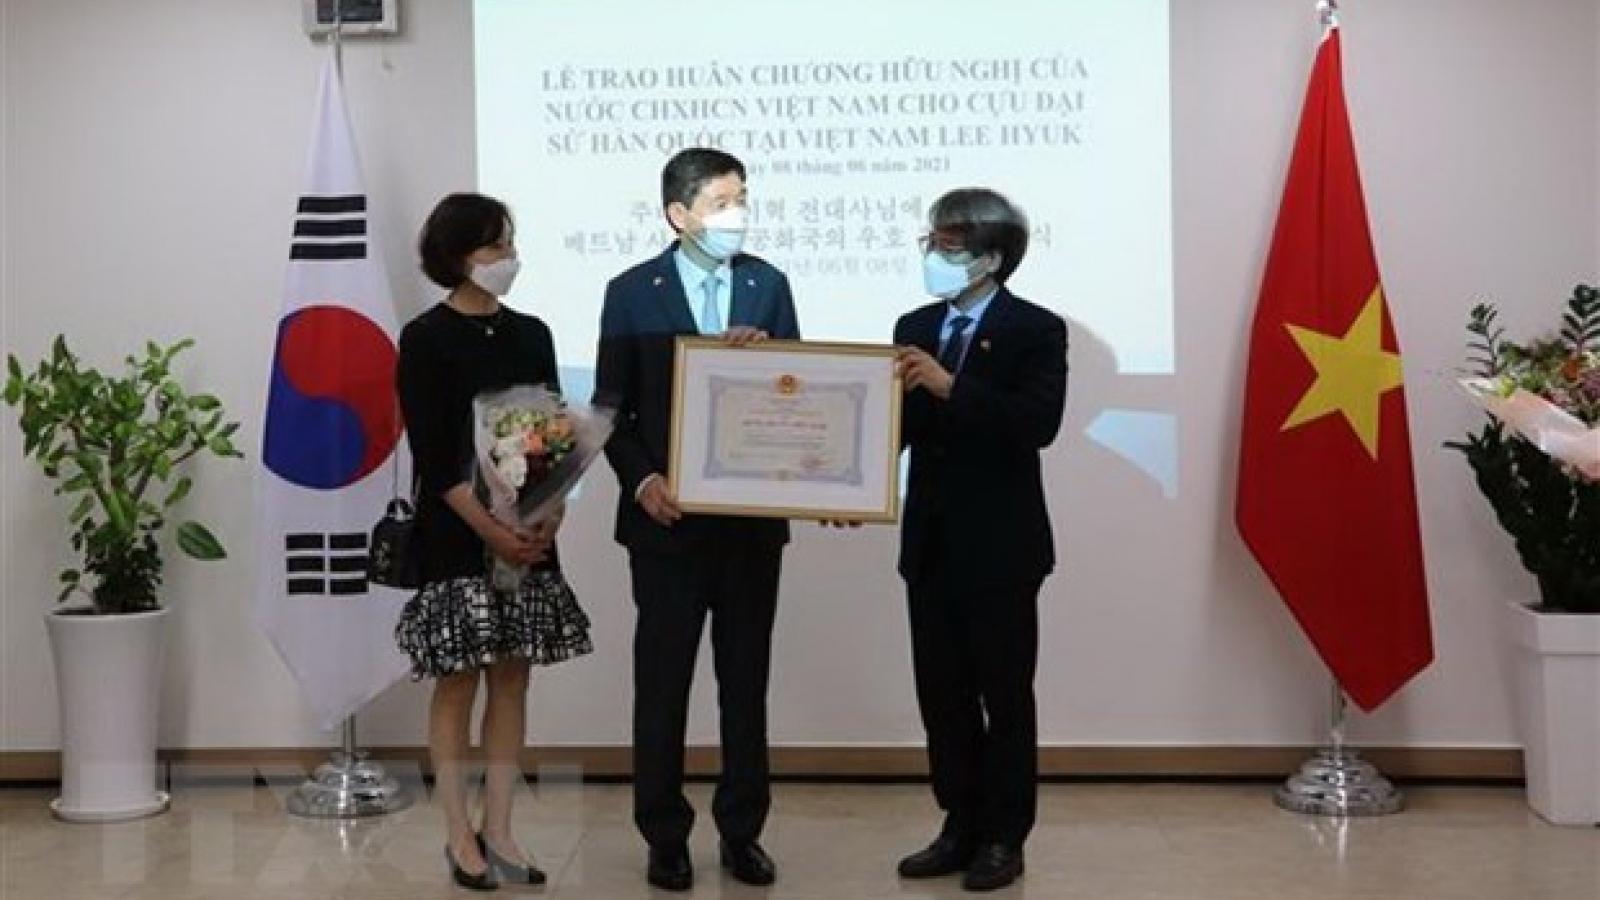 Former RoK Ambassador to Vietnam honoured with Friendship Order